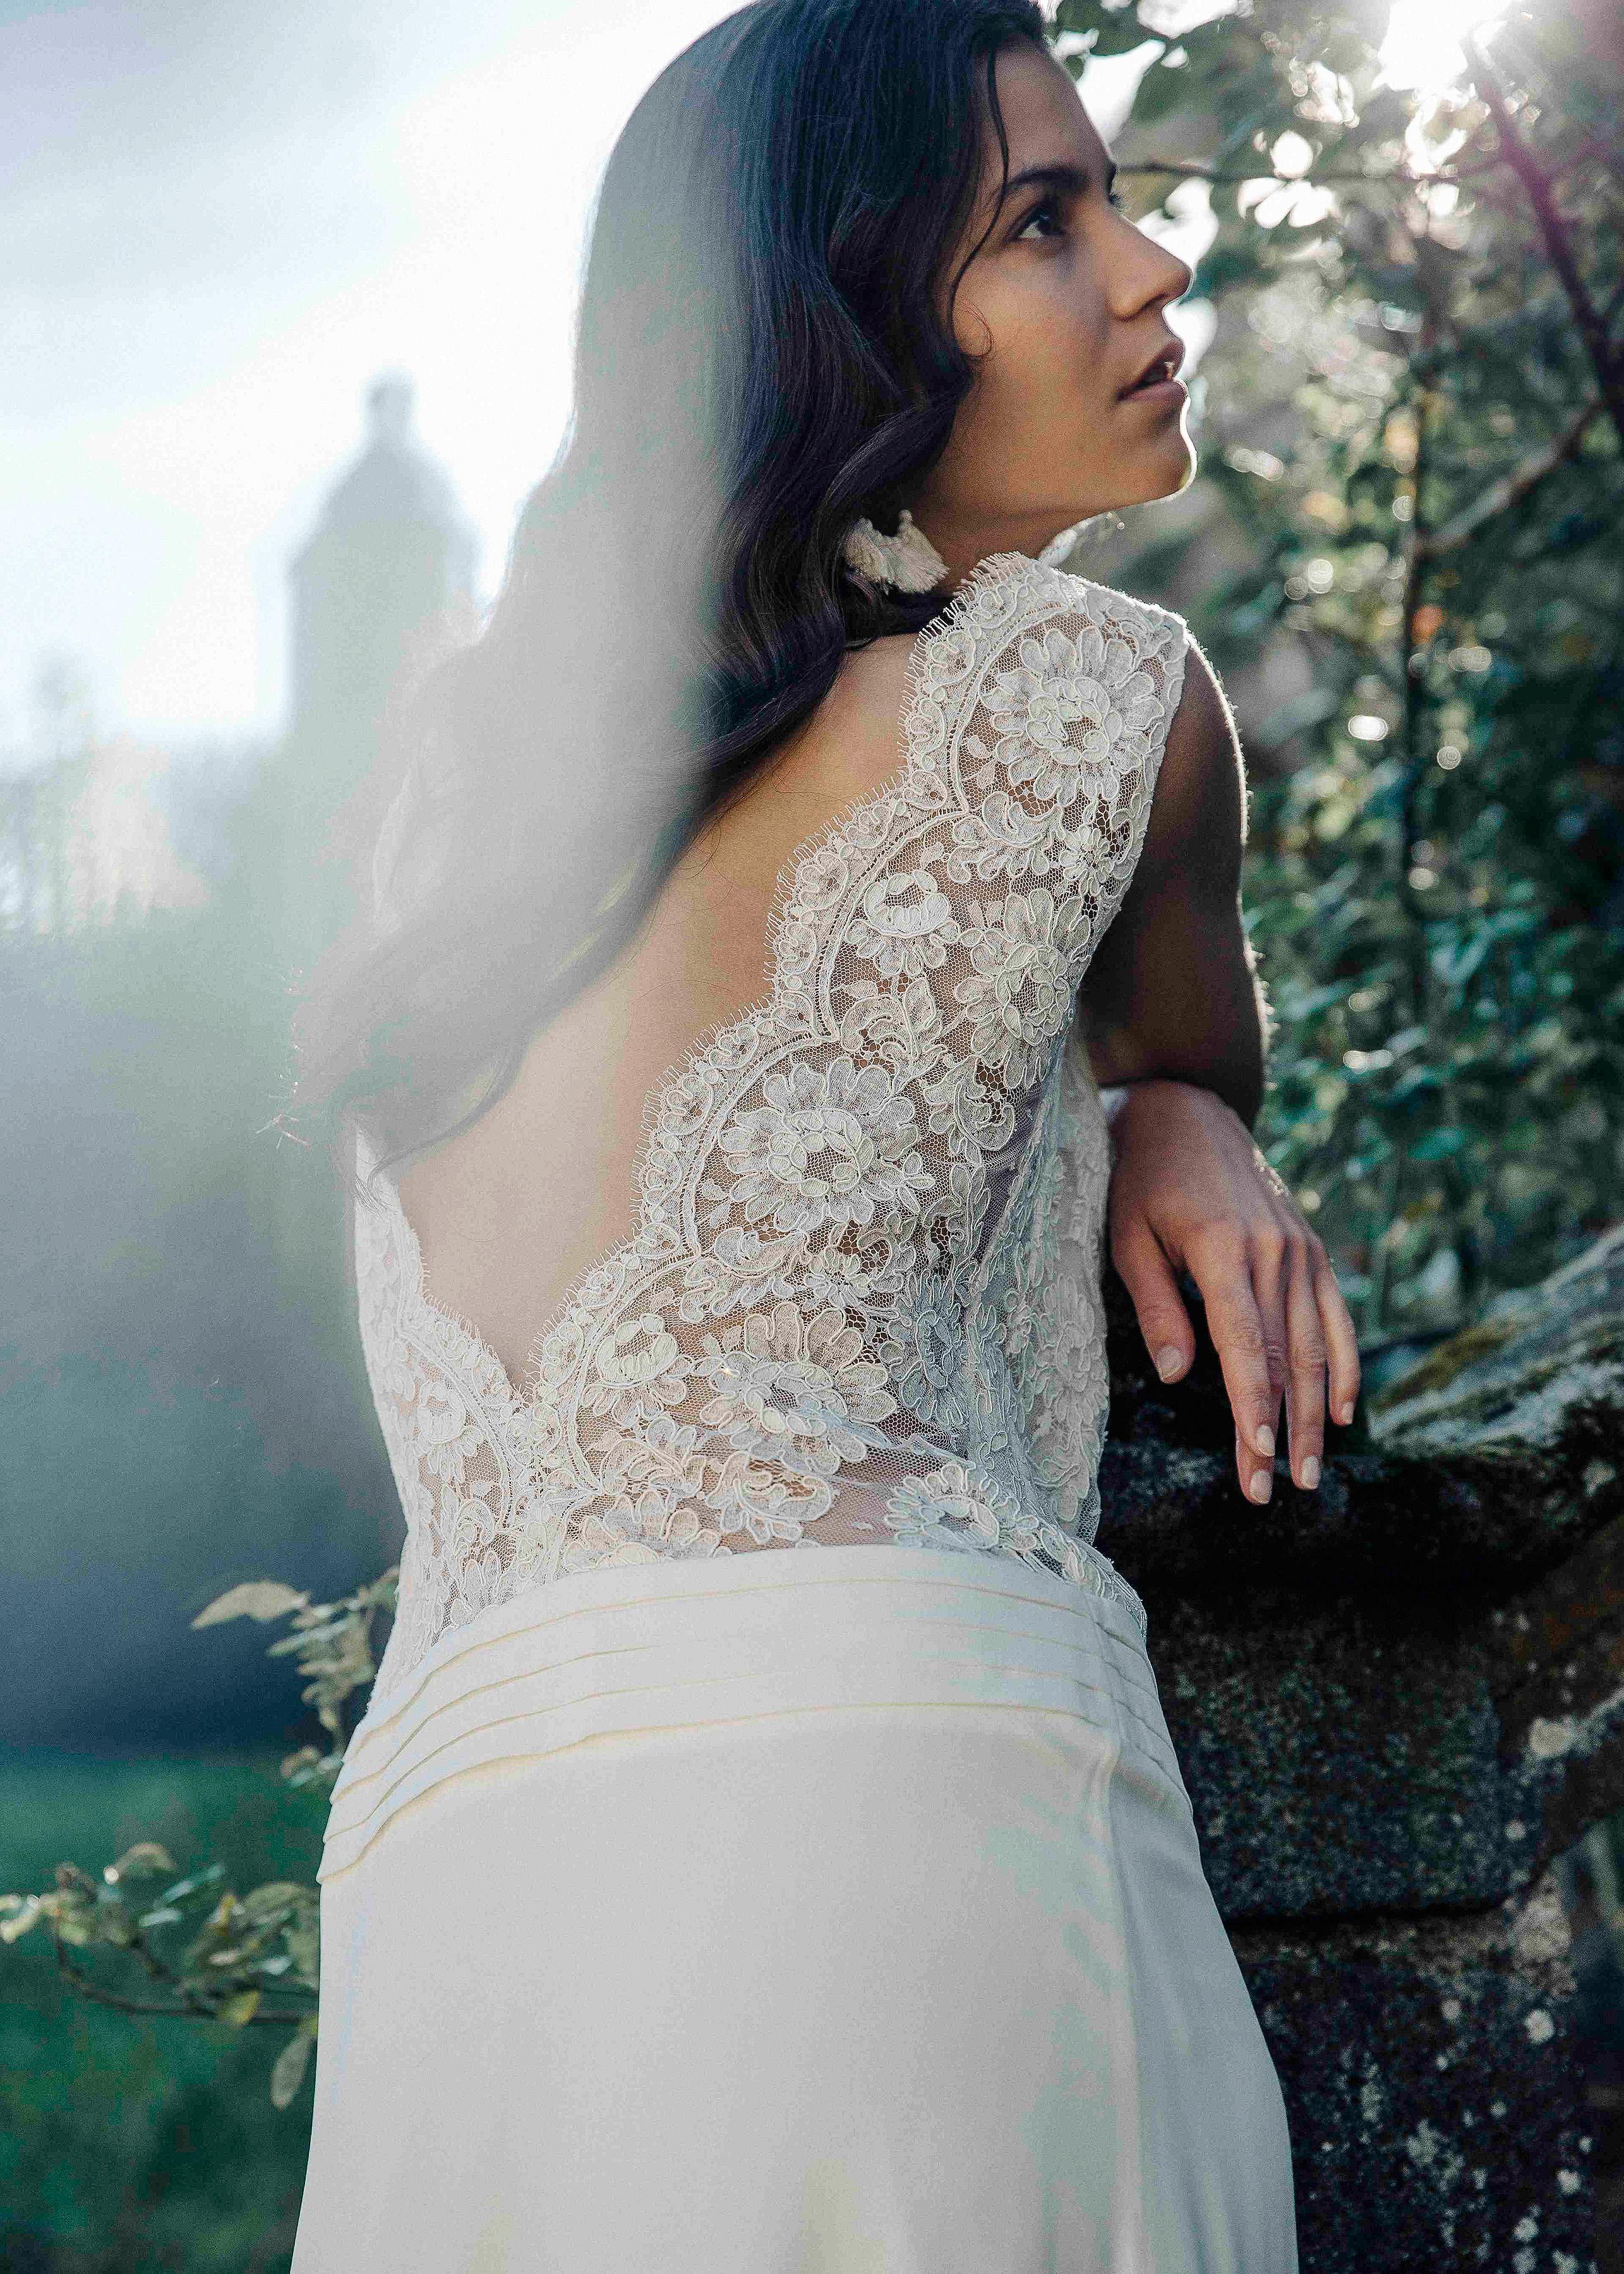 Laure de Sagazan Wedding Dress with lace back